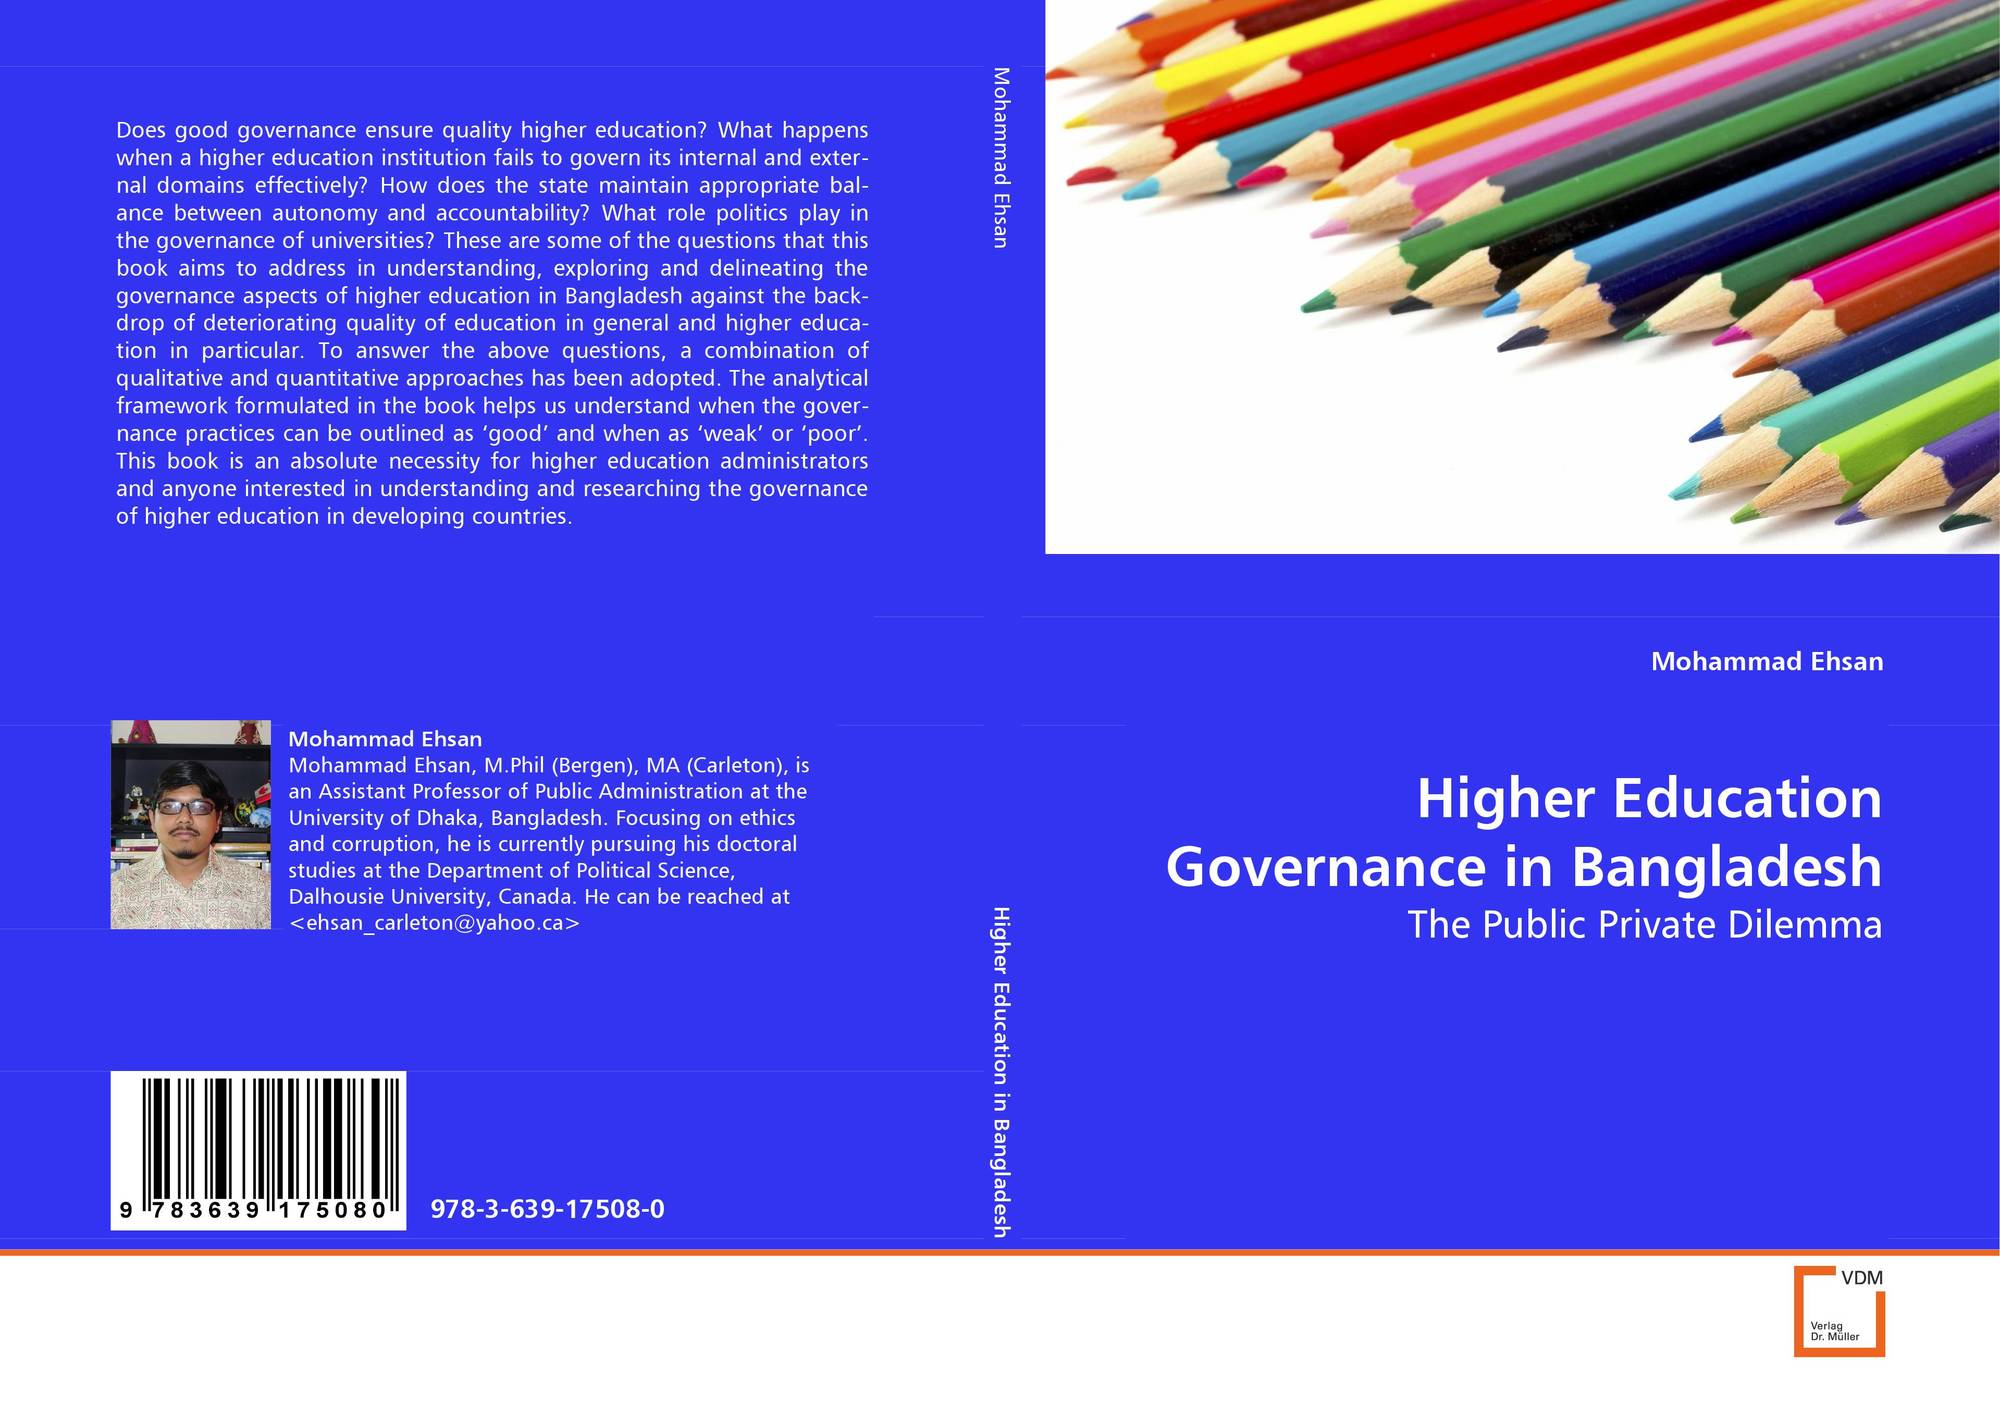 Higher Education Governance in Bangladesh, 978-3-639-17508-0